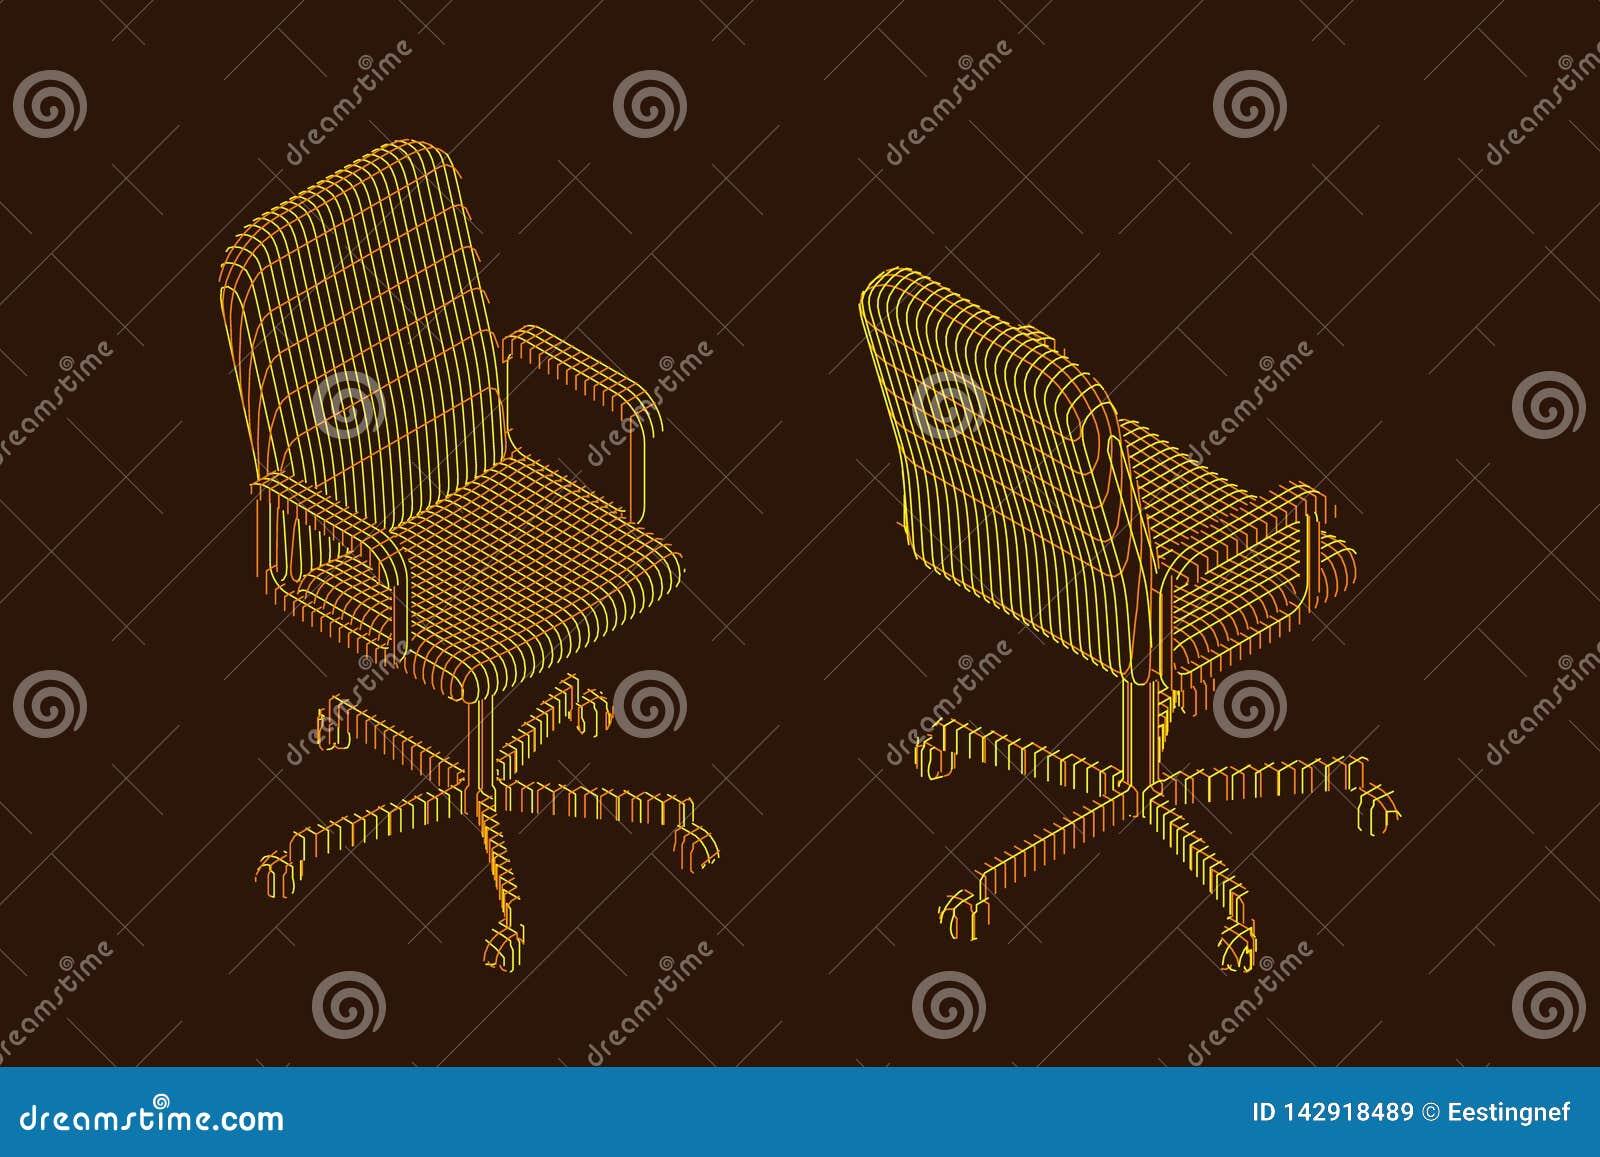 Striped стул офиса иллюстрация контура вектора